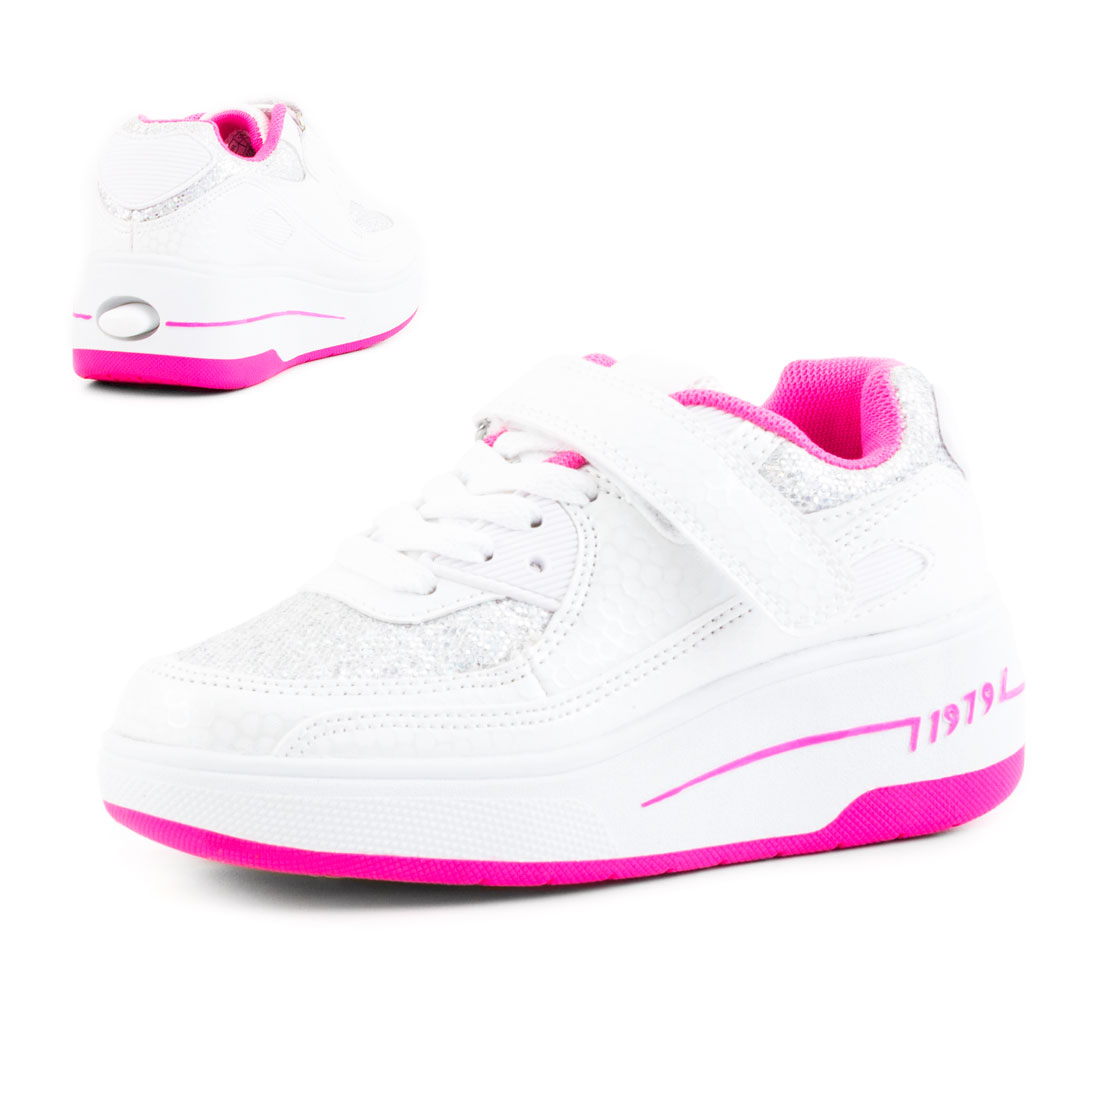 neu m dchen jungen kinder skate sneaker rollschuhe turnschuhe gr e 28 37 ebay. Black Bedroom Furniture Sets. Home Design Ideas